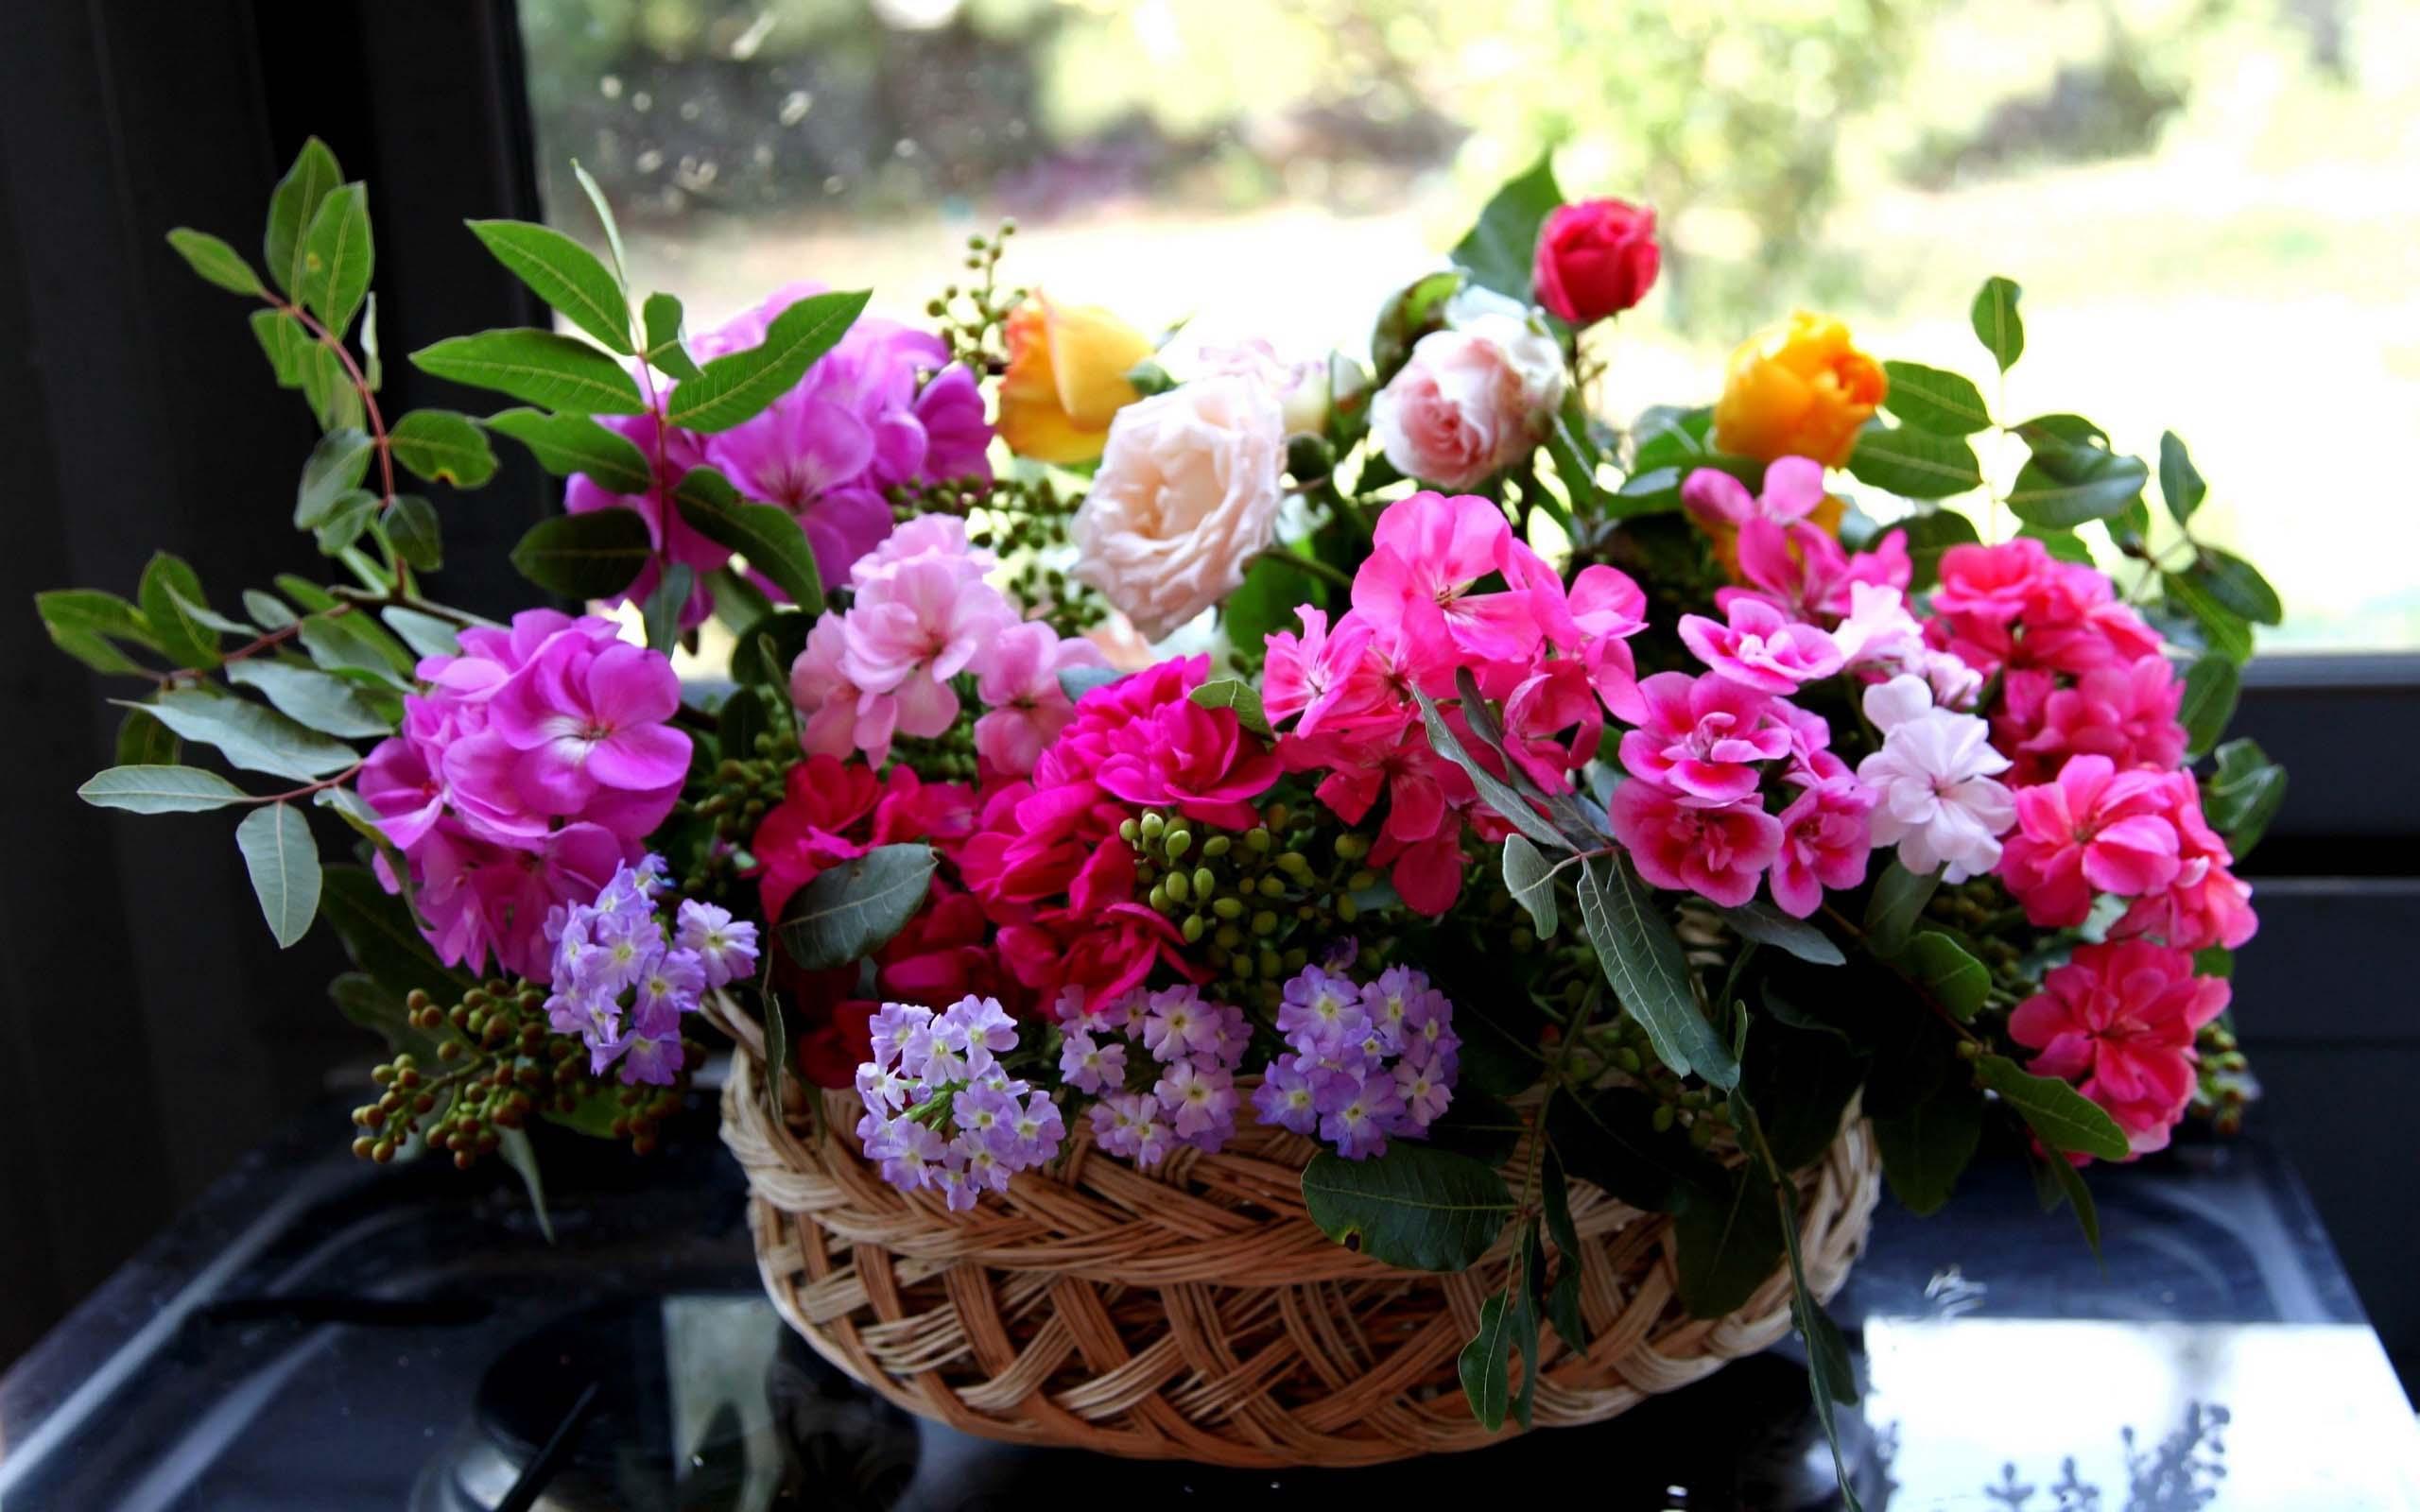 http://dreempics.com/img/picture/Apr/13/837bc650a6f72c7564d6be87b9394443/2.jpg